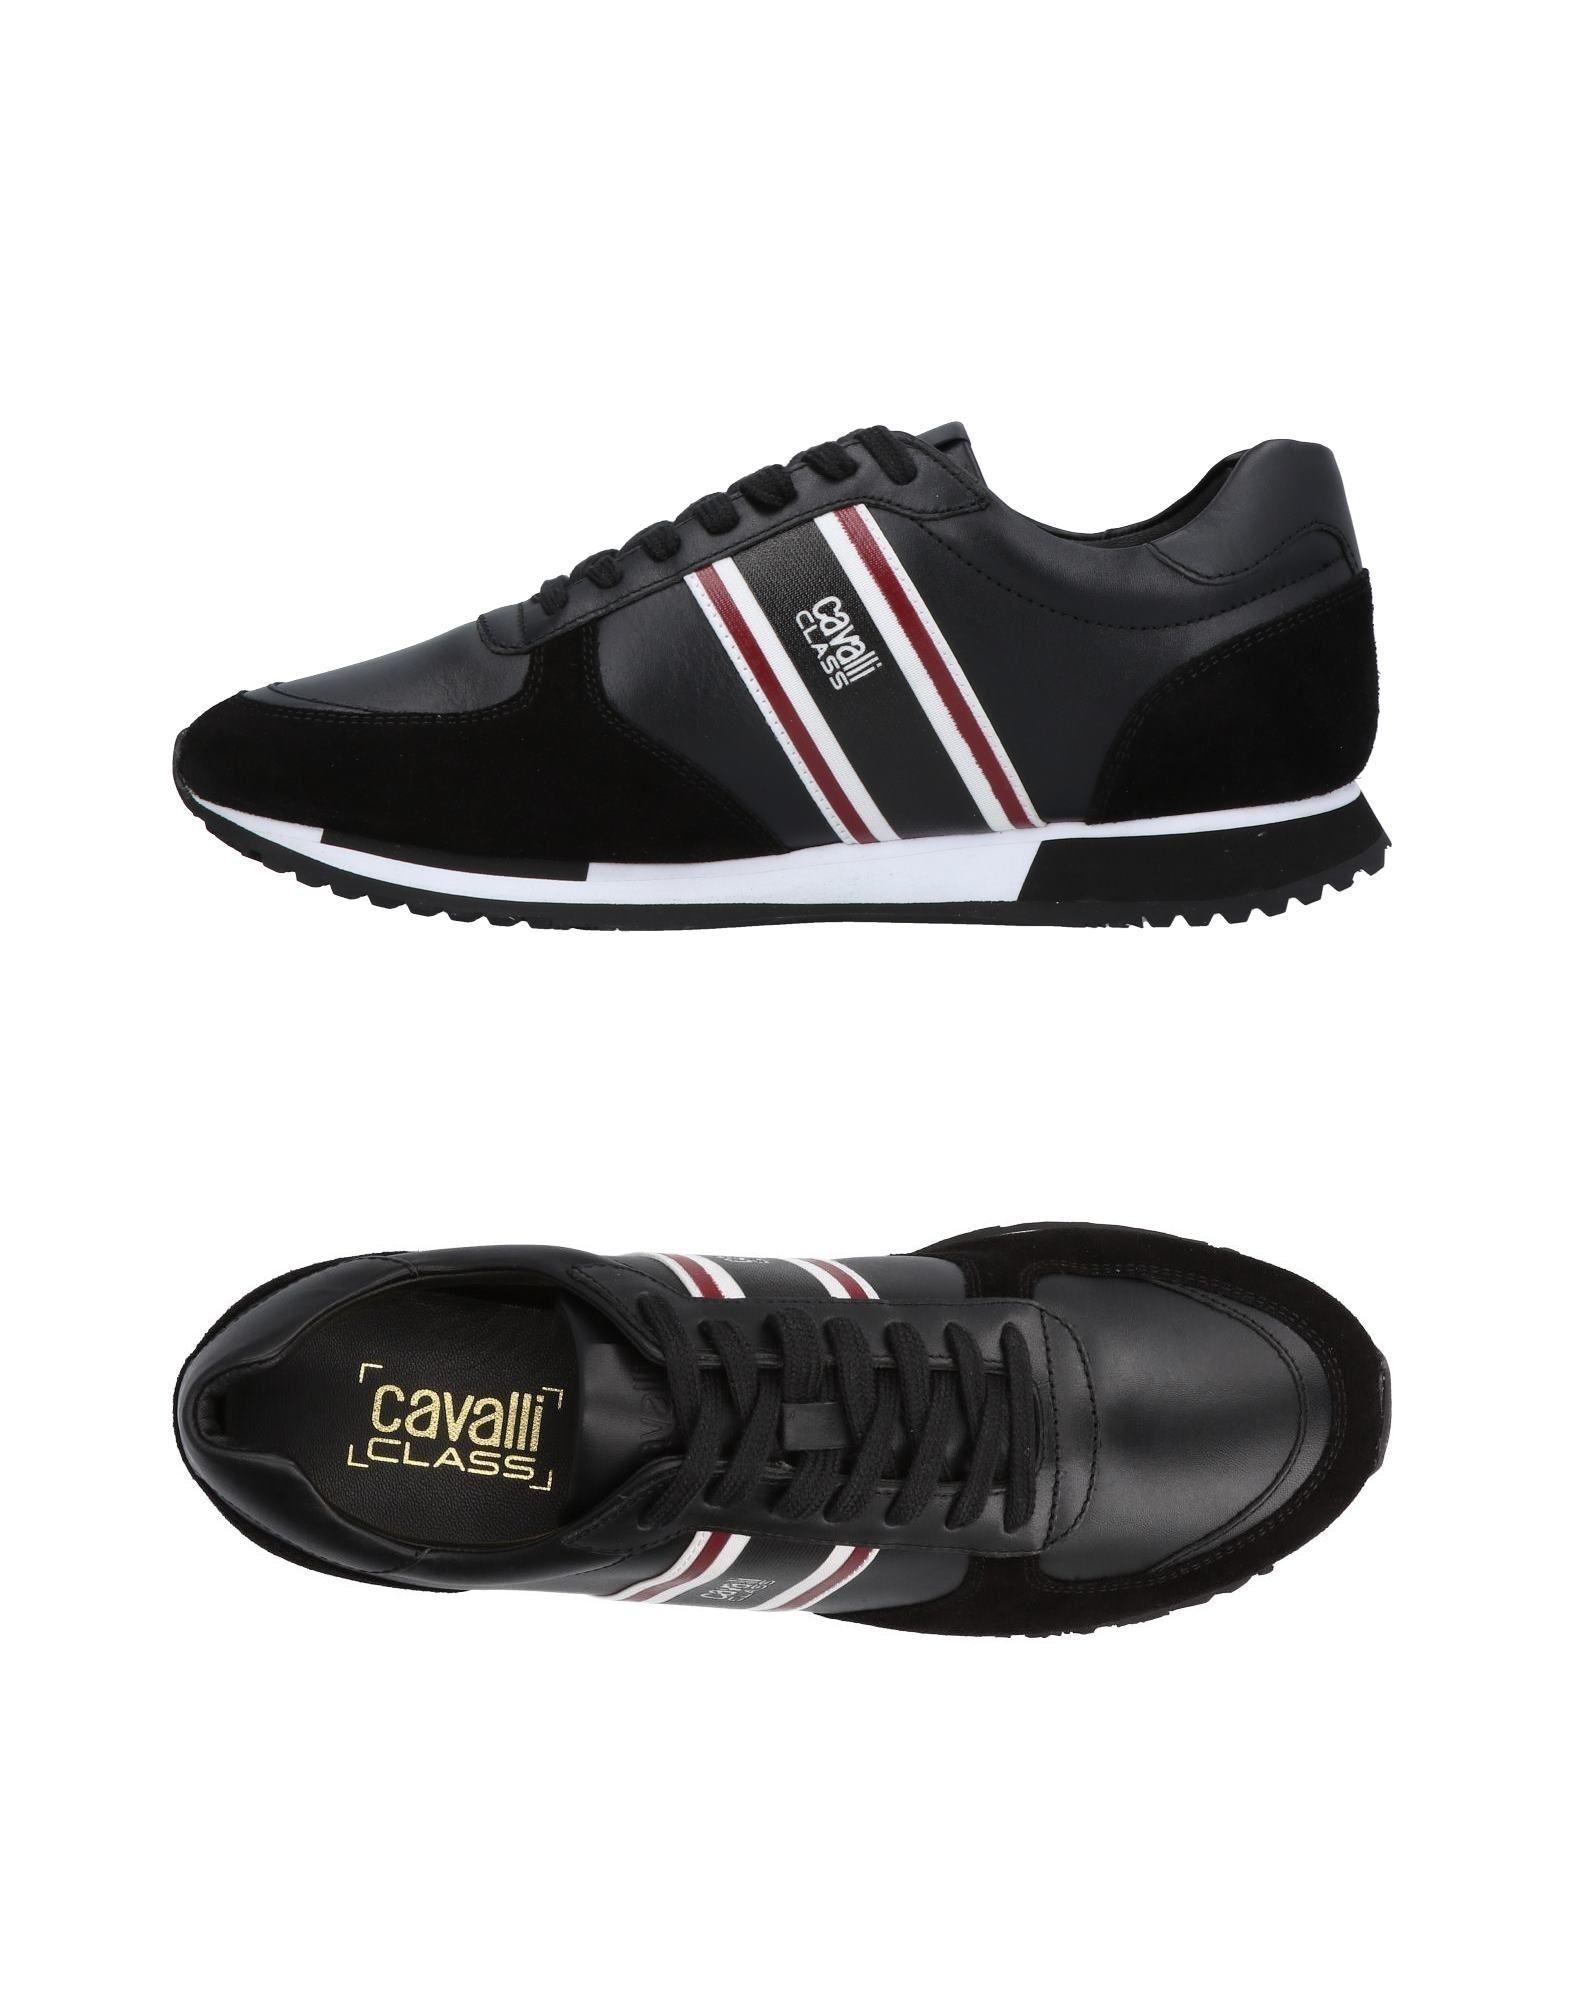 Classe Cavalli Bas-roberto Hauts Et Chaussures De Sport 9hfJkTqxhp